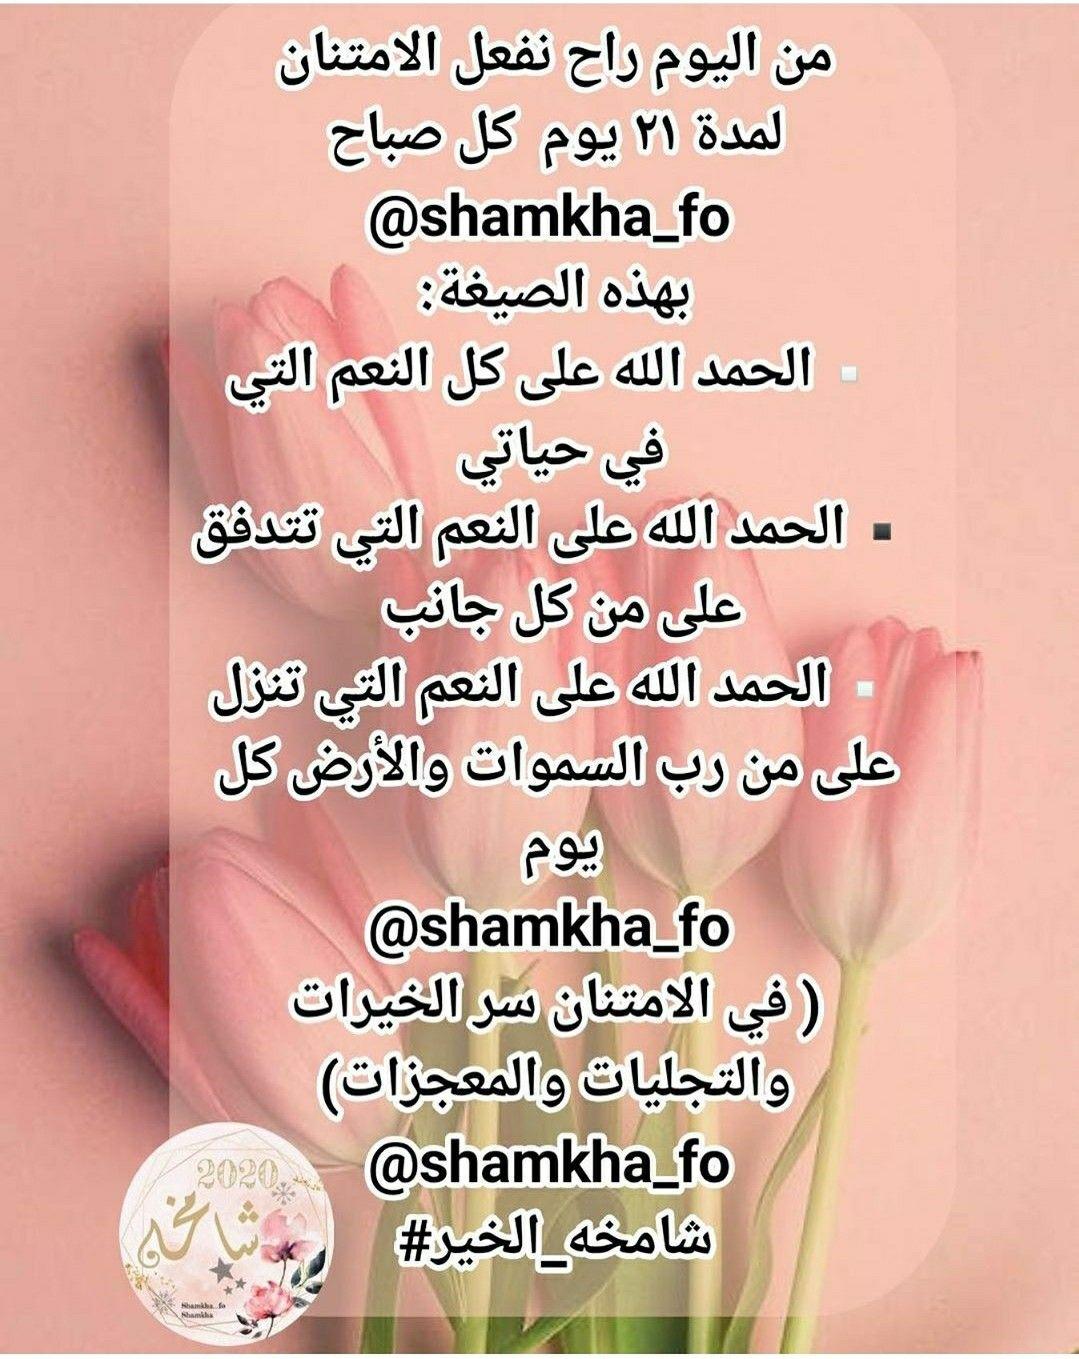 Pin By Um Alhasan On أدعية مهمه وعظيمه جدااا Quran Quotes Love Quran Quotes Love Quotes